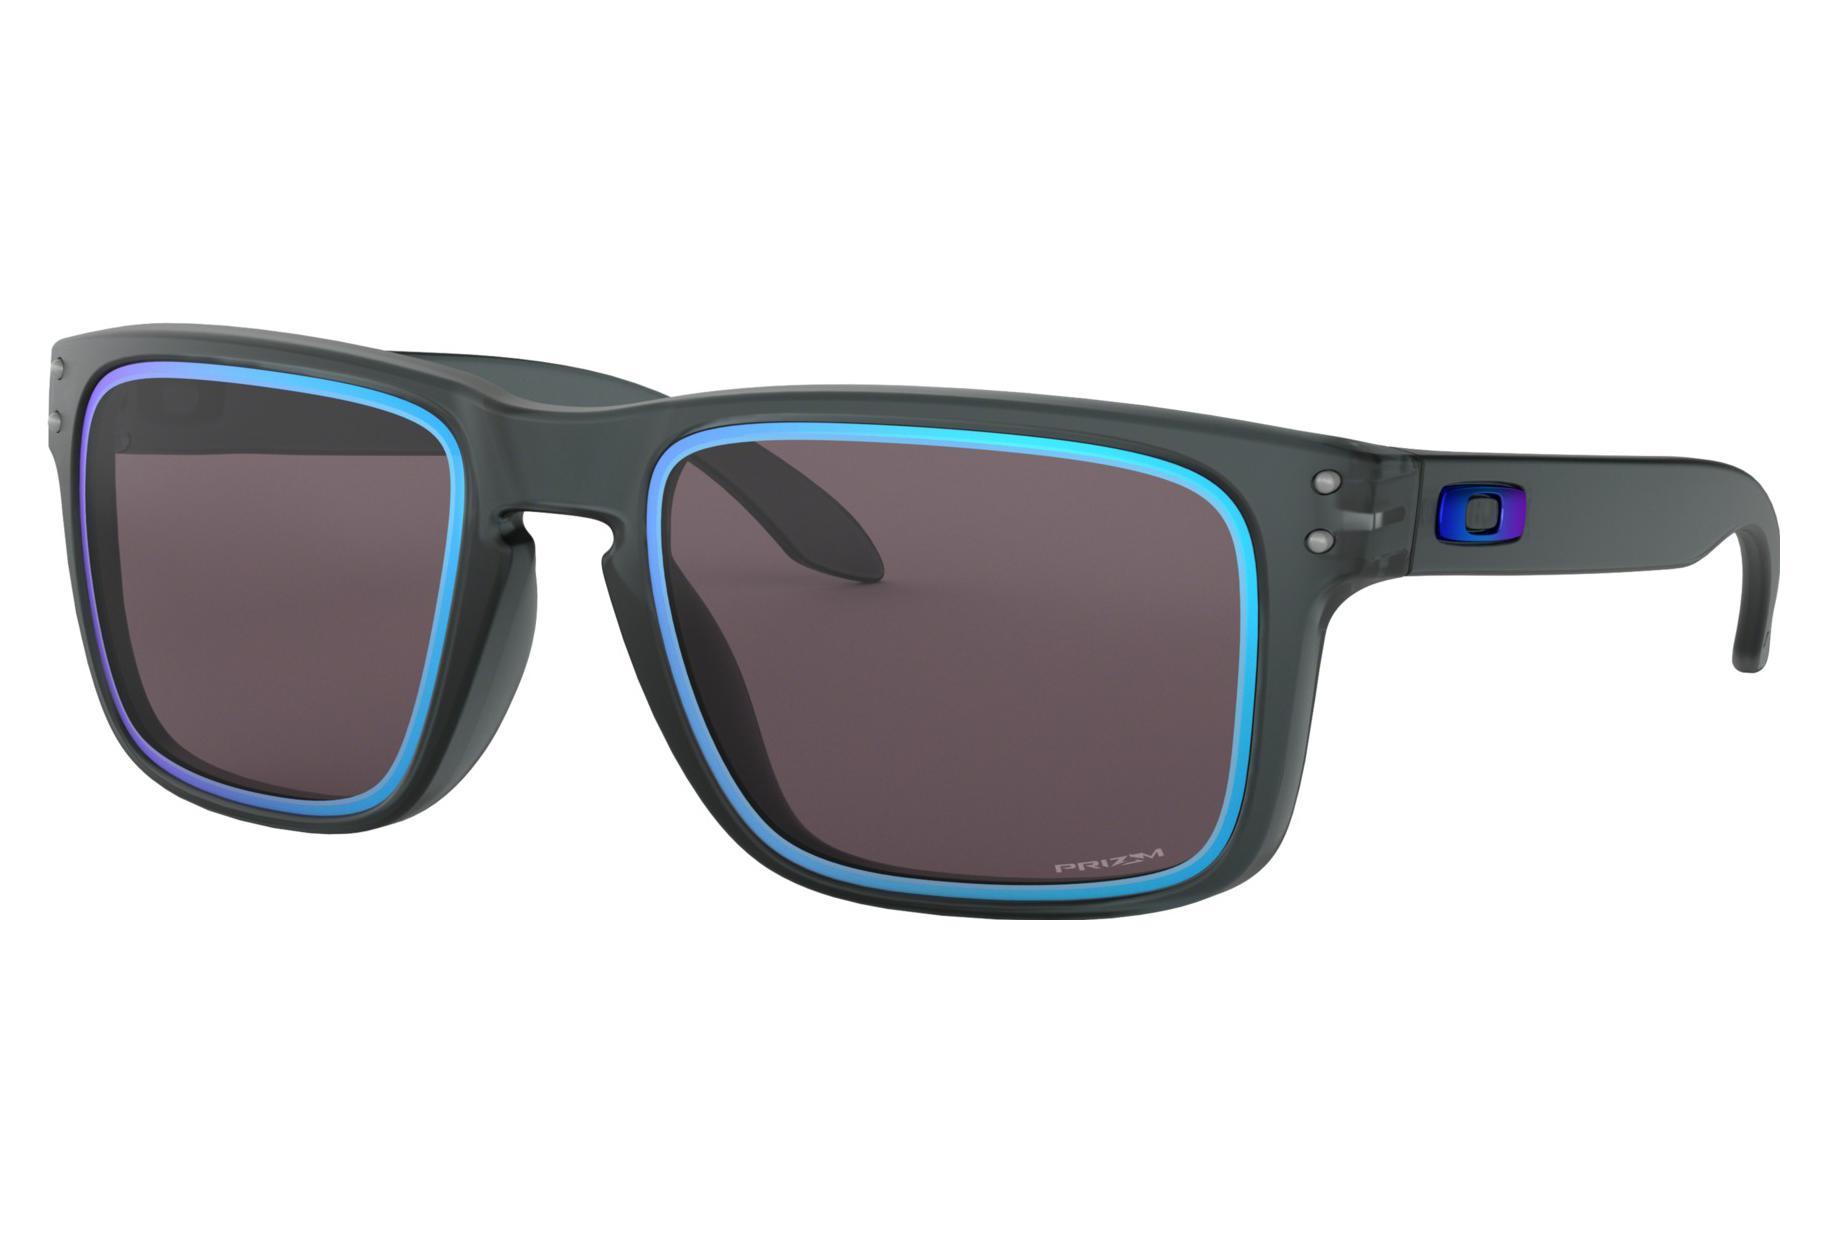 49bef548ec Gafas de sol Oakley Holbrook Fire and Ice Colección Mate Cristal ...